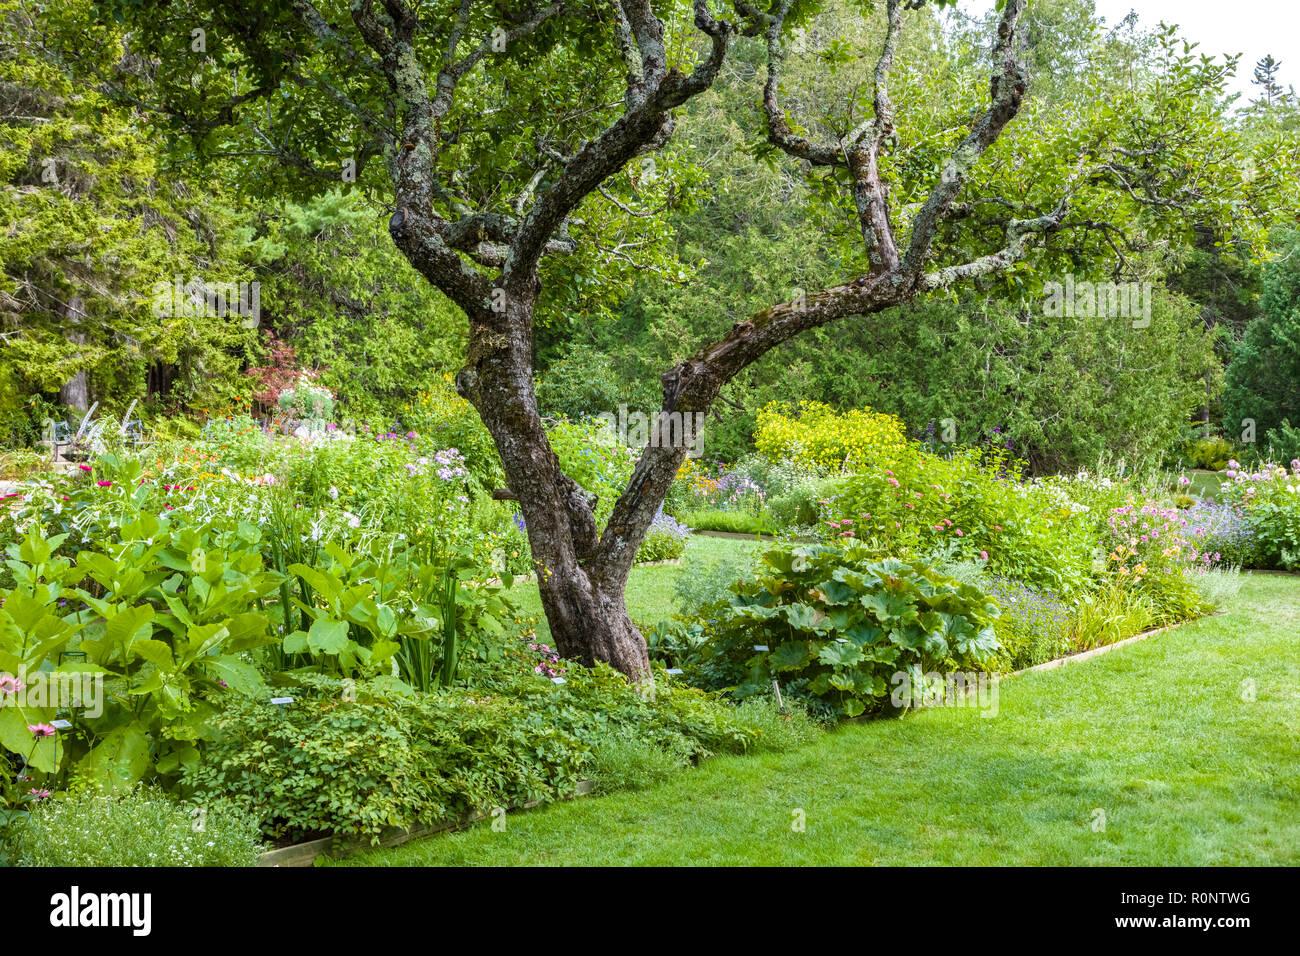 Thuya Garden in Northeast Harbor on Mount Desert Island in Maine, United States - Stock Image